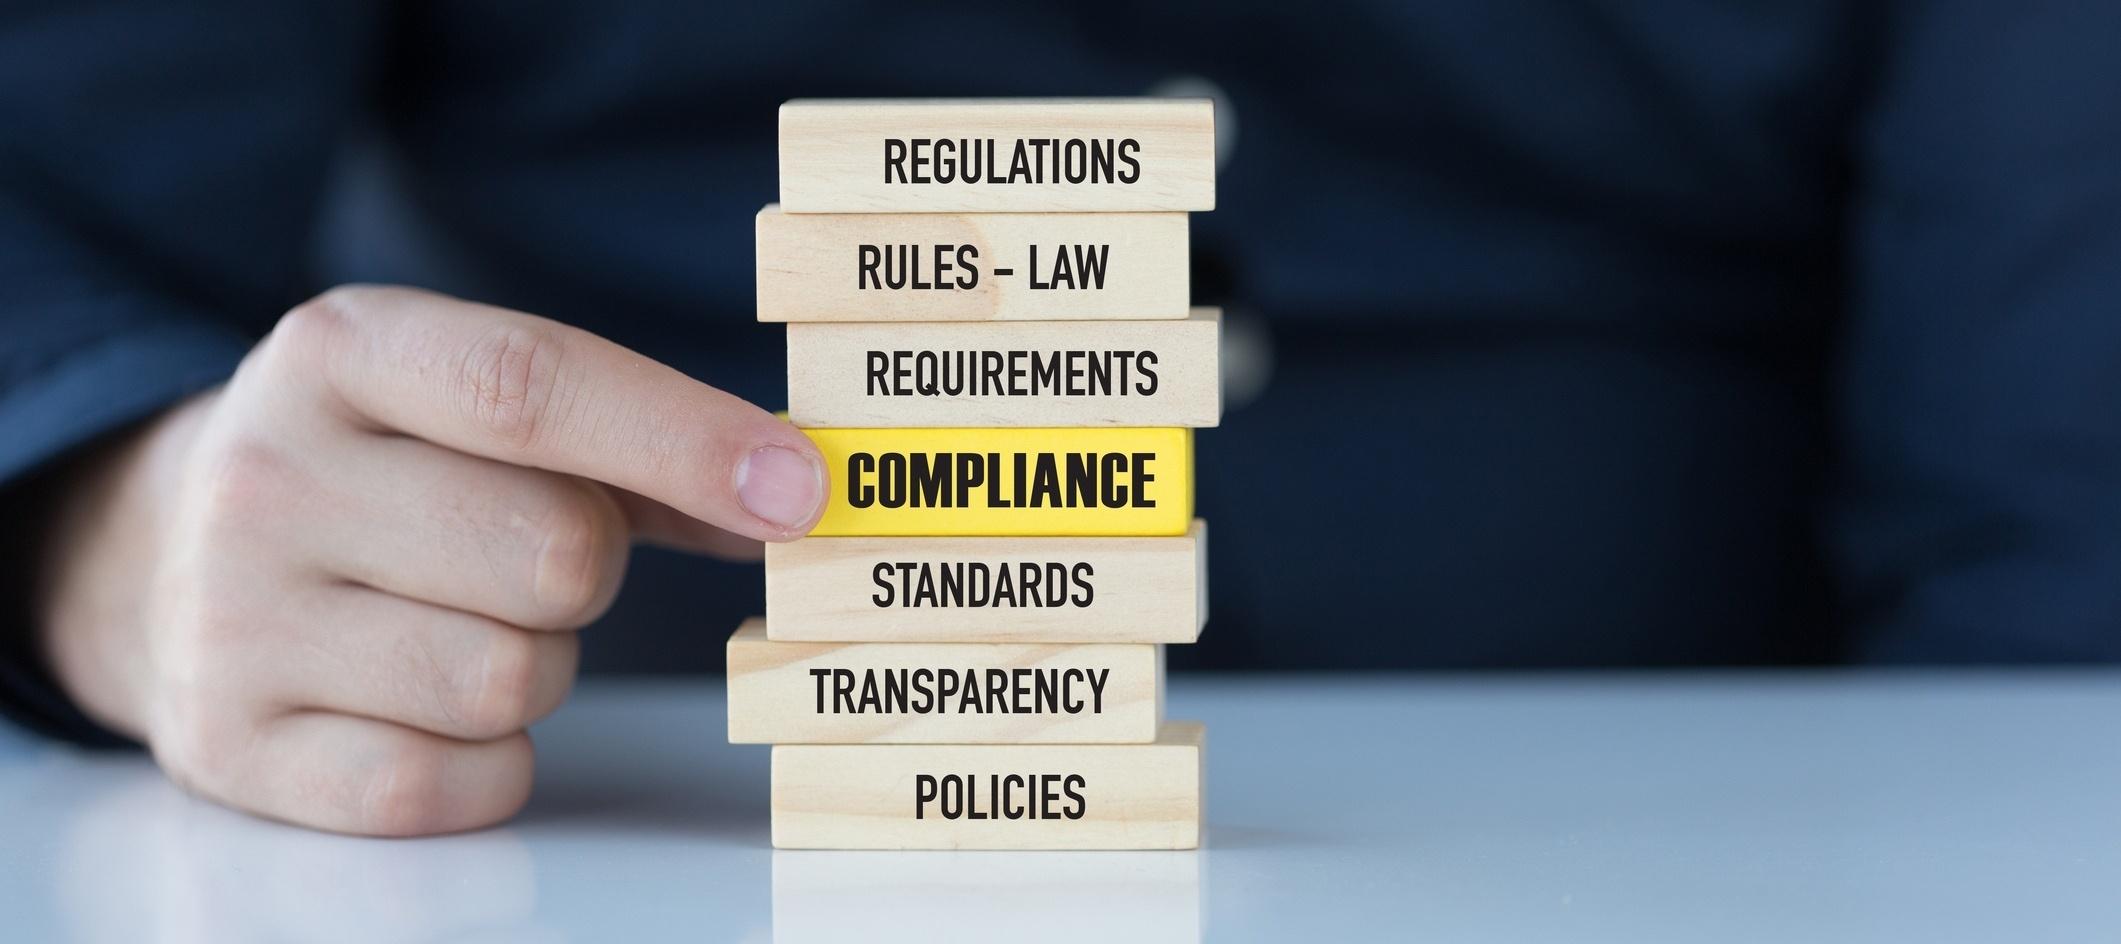 Expecting Regulation Reform-677930-edited.jpg